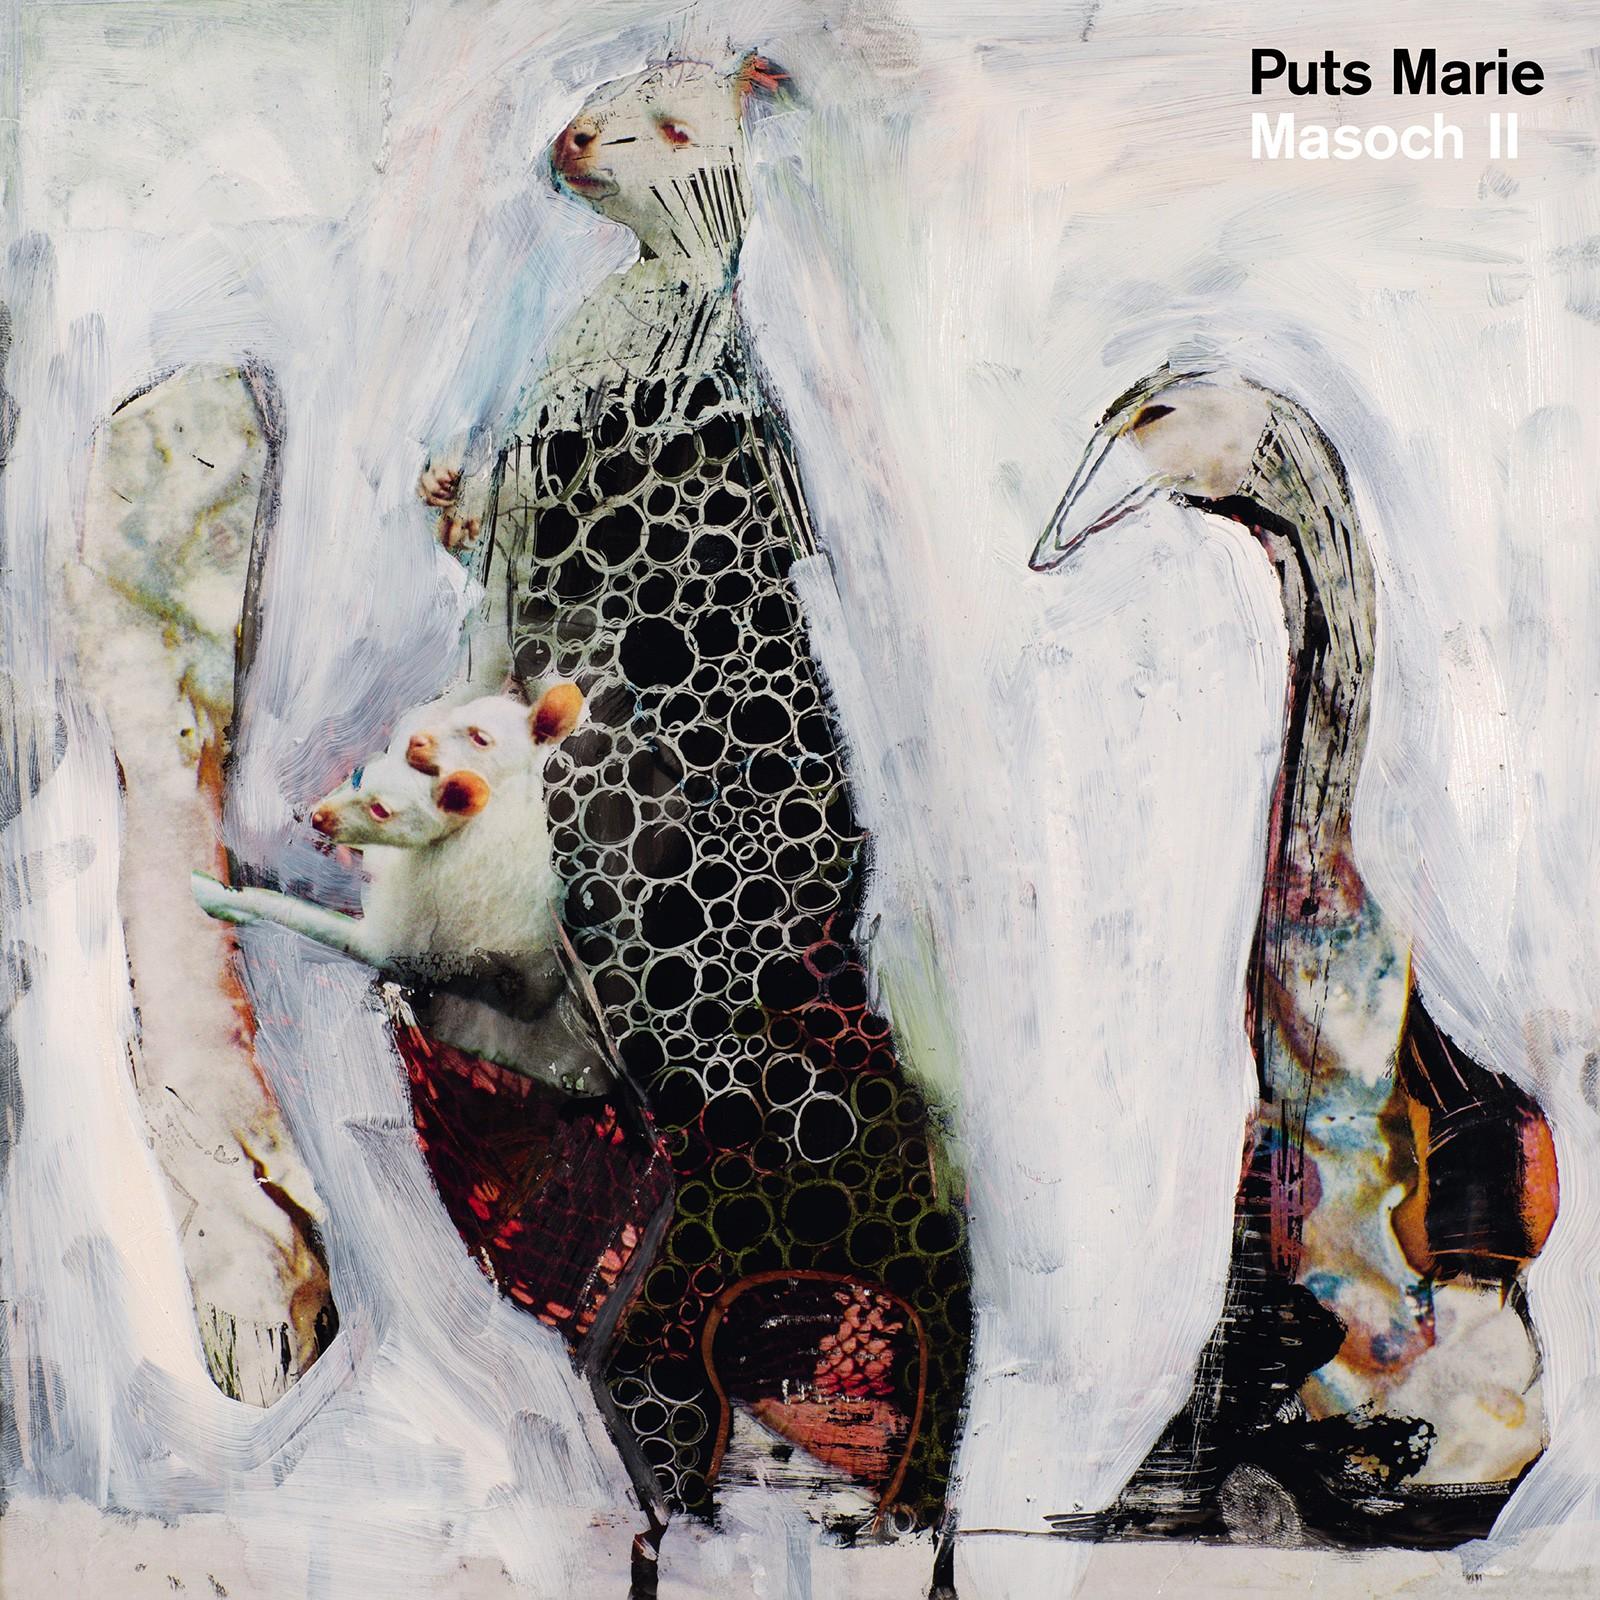 PUTS MARIE – Masoch II